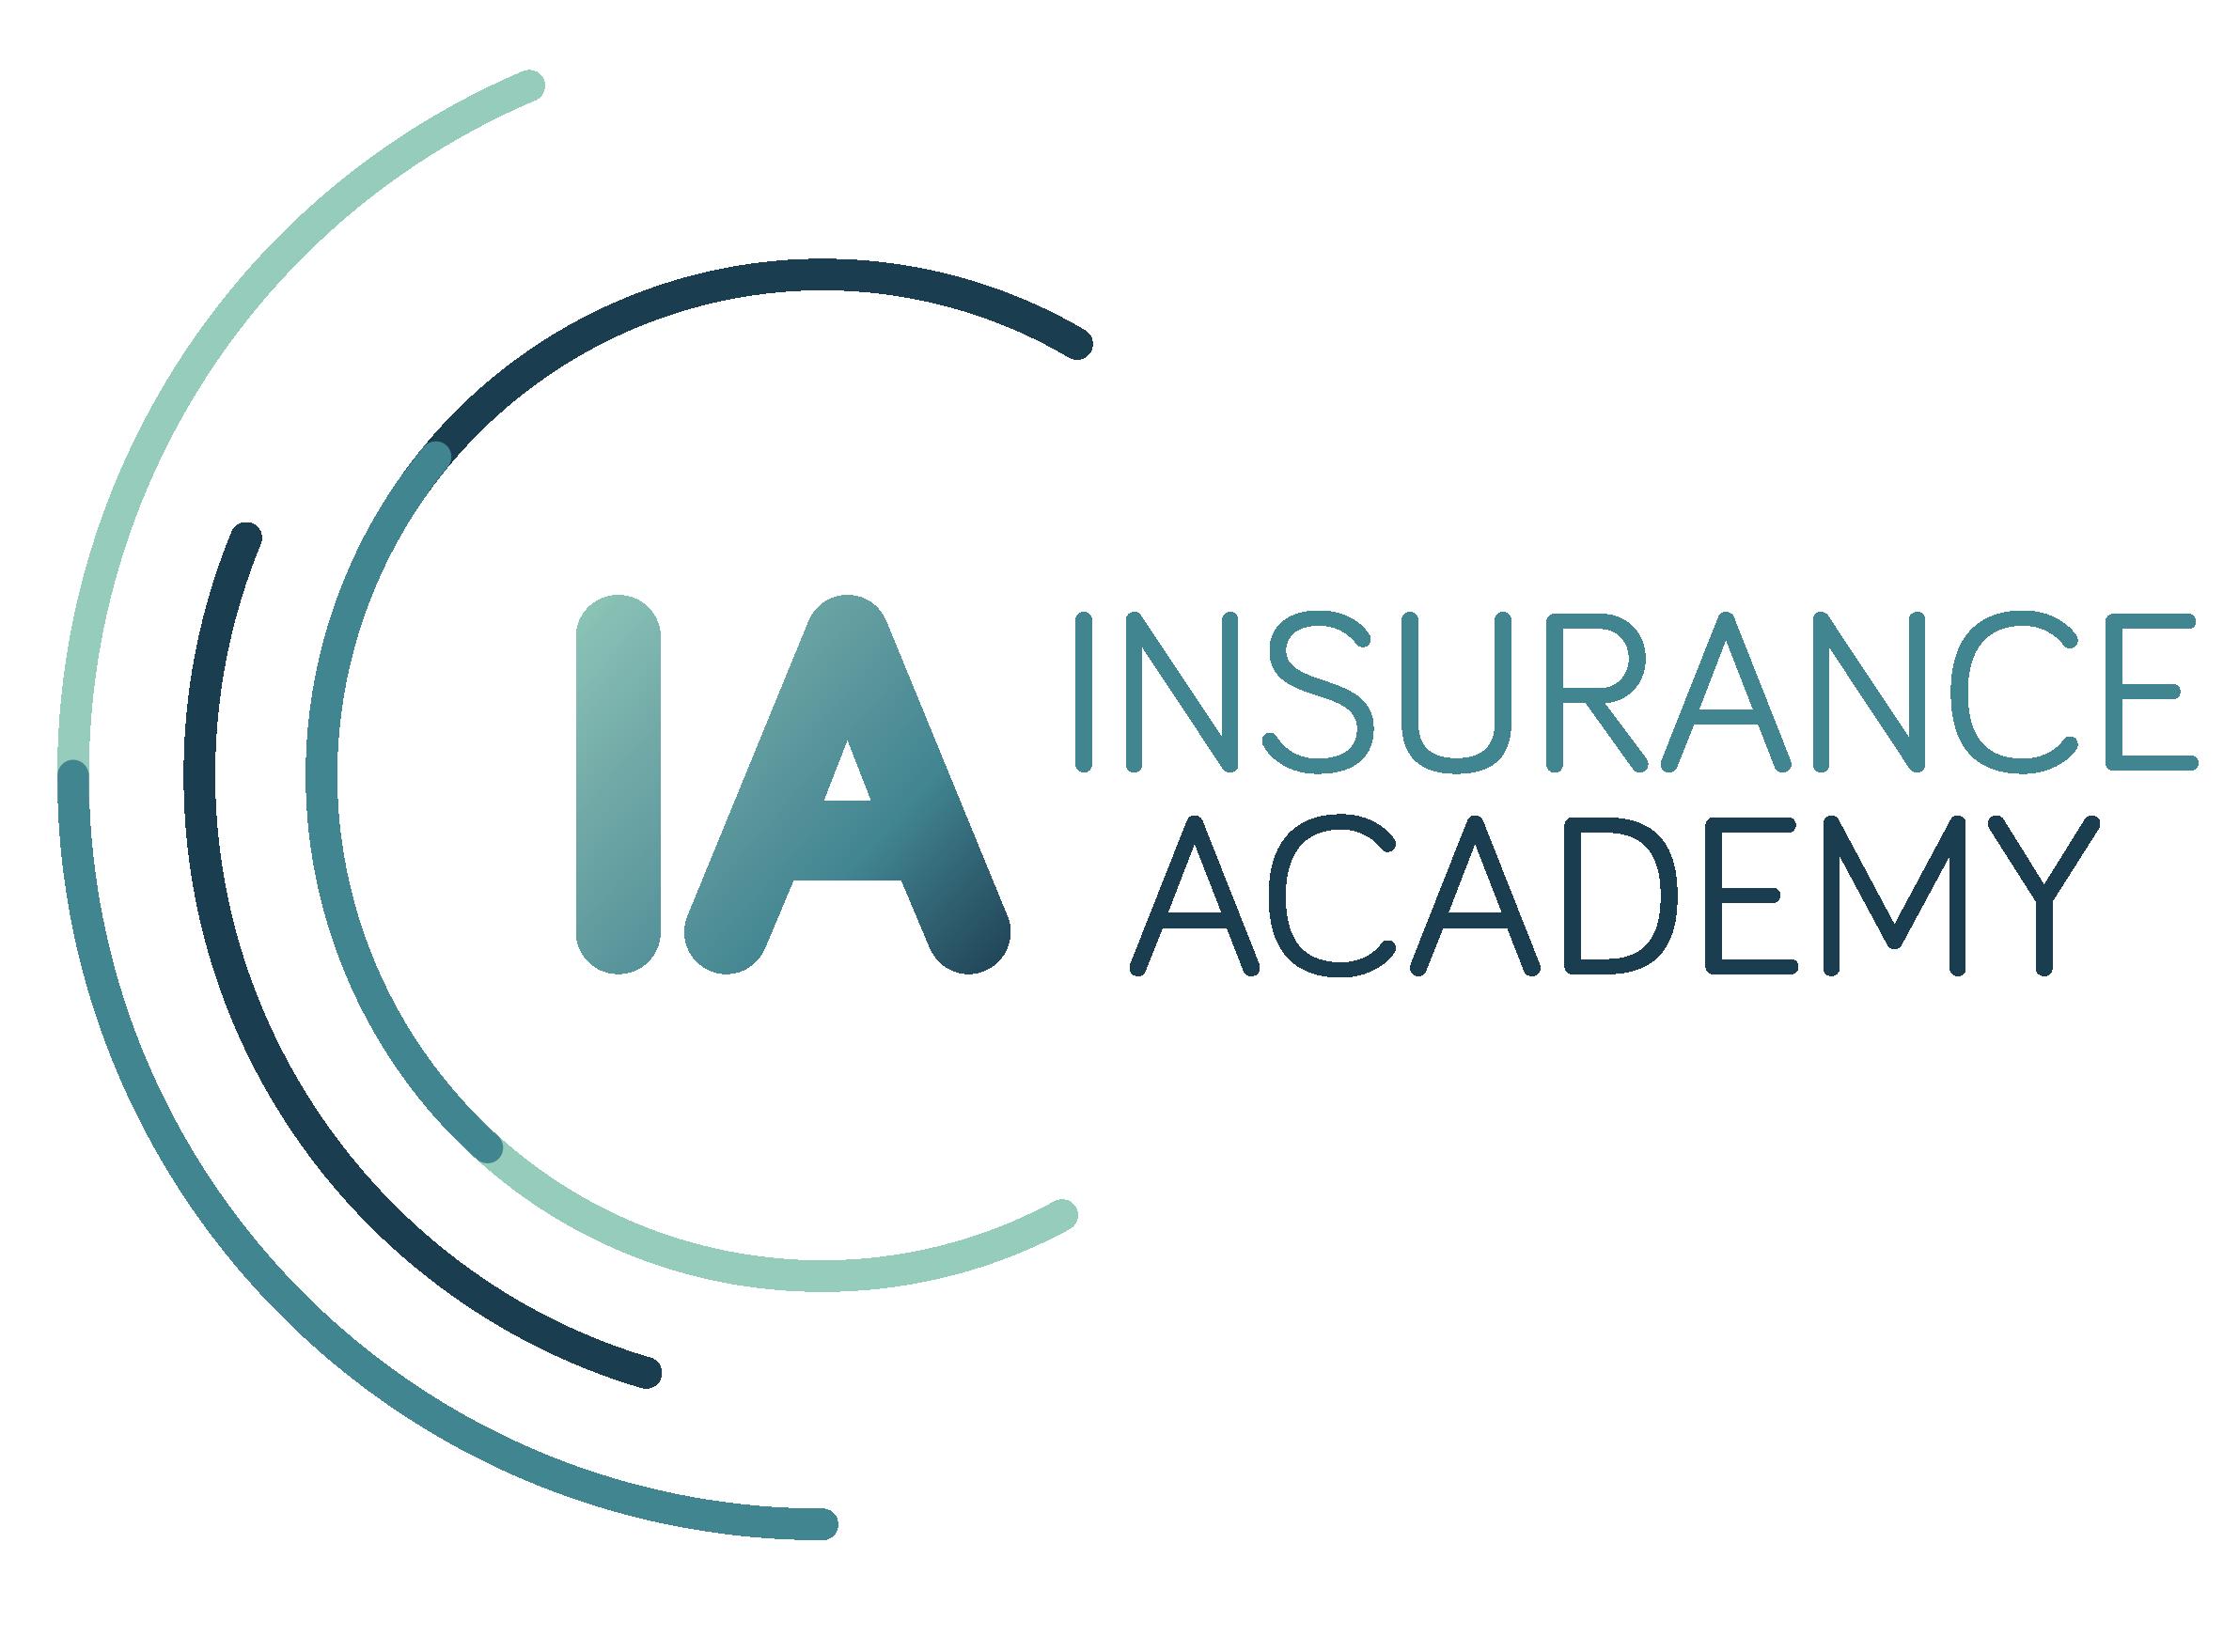 innusrance academy